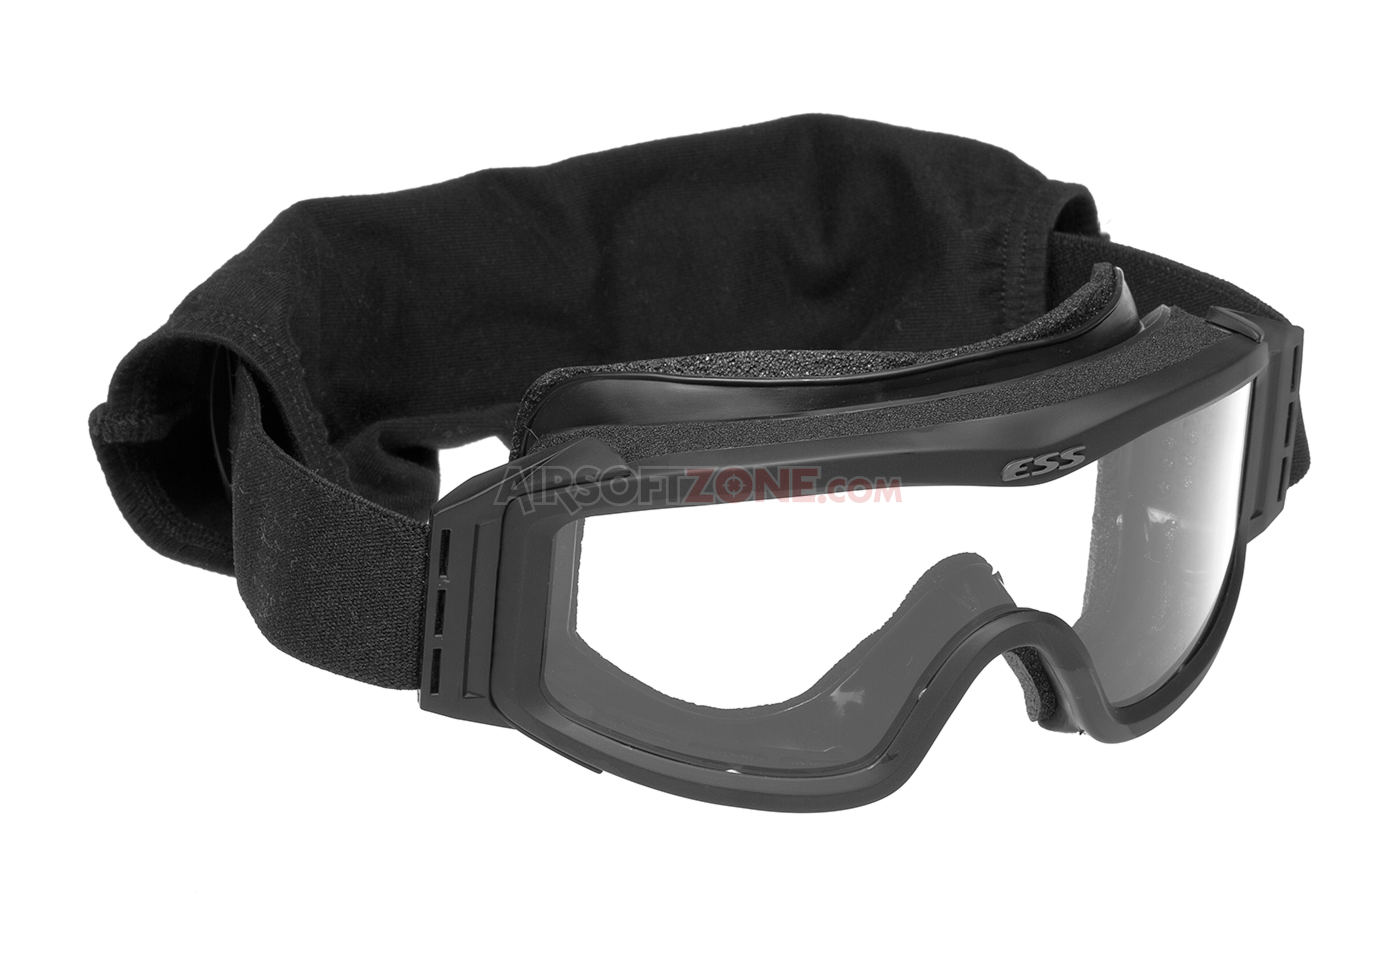 bca2d6900d Profile NVG Goggle Black (ESS) - Goggles - Eyewear - Protective ...